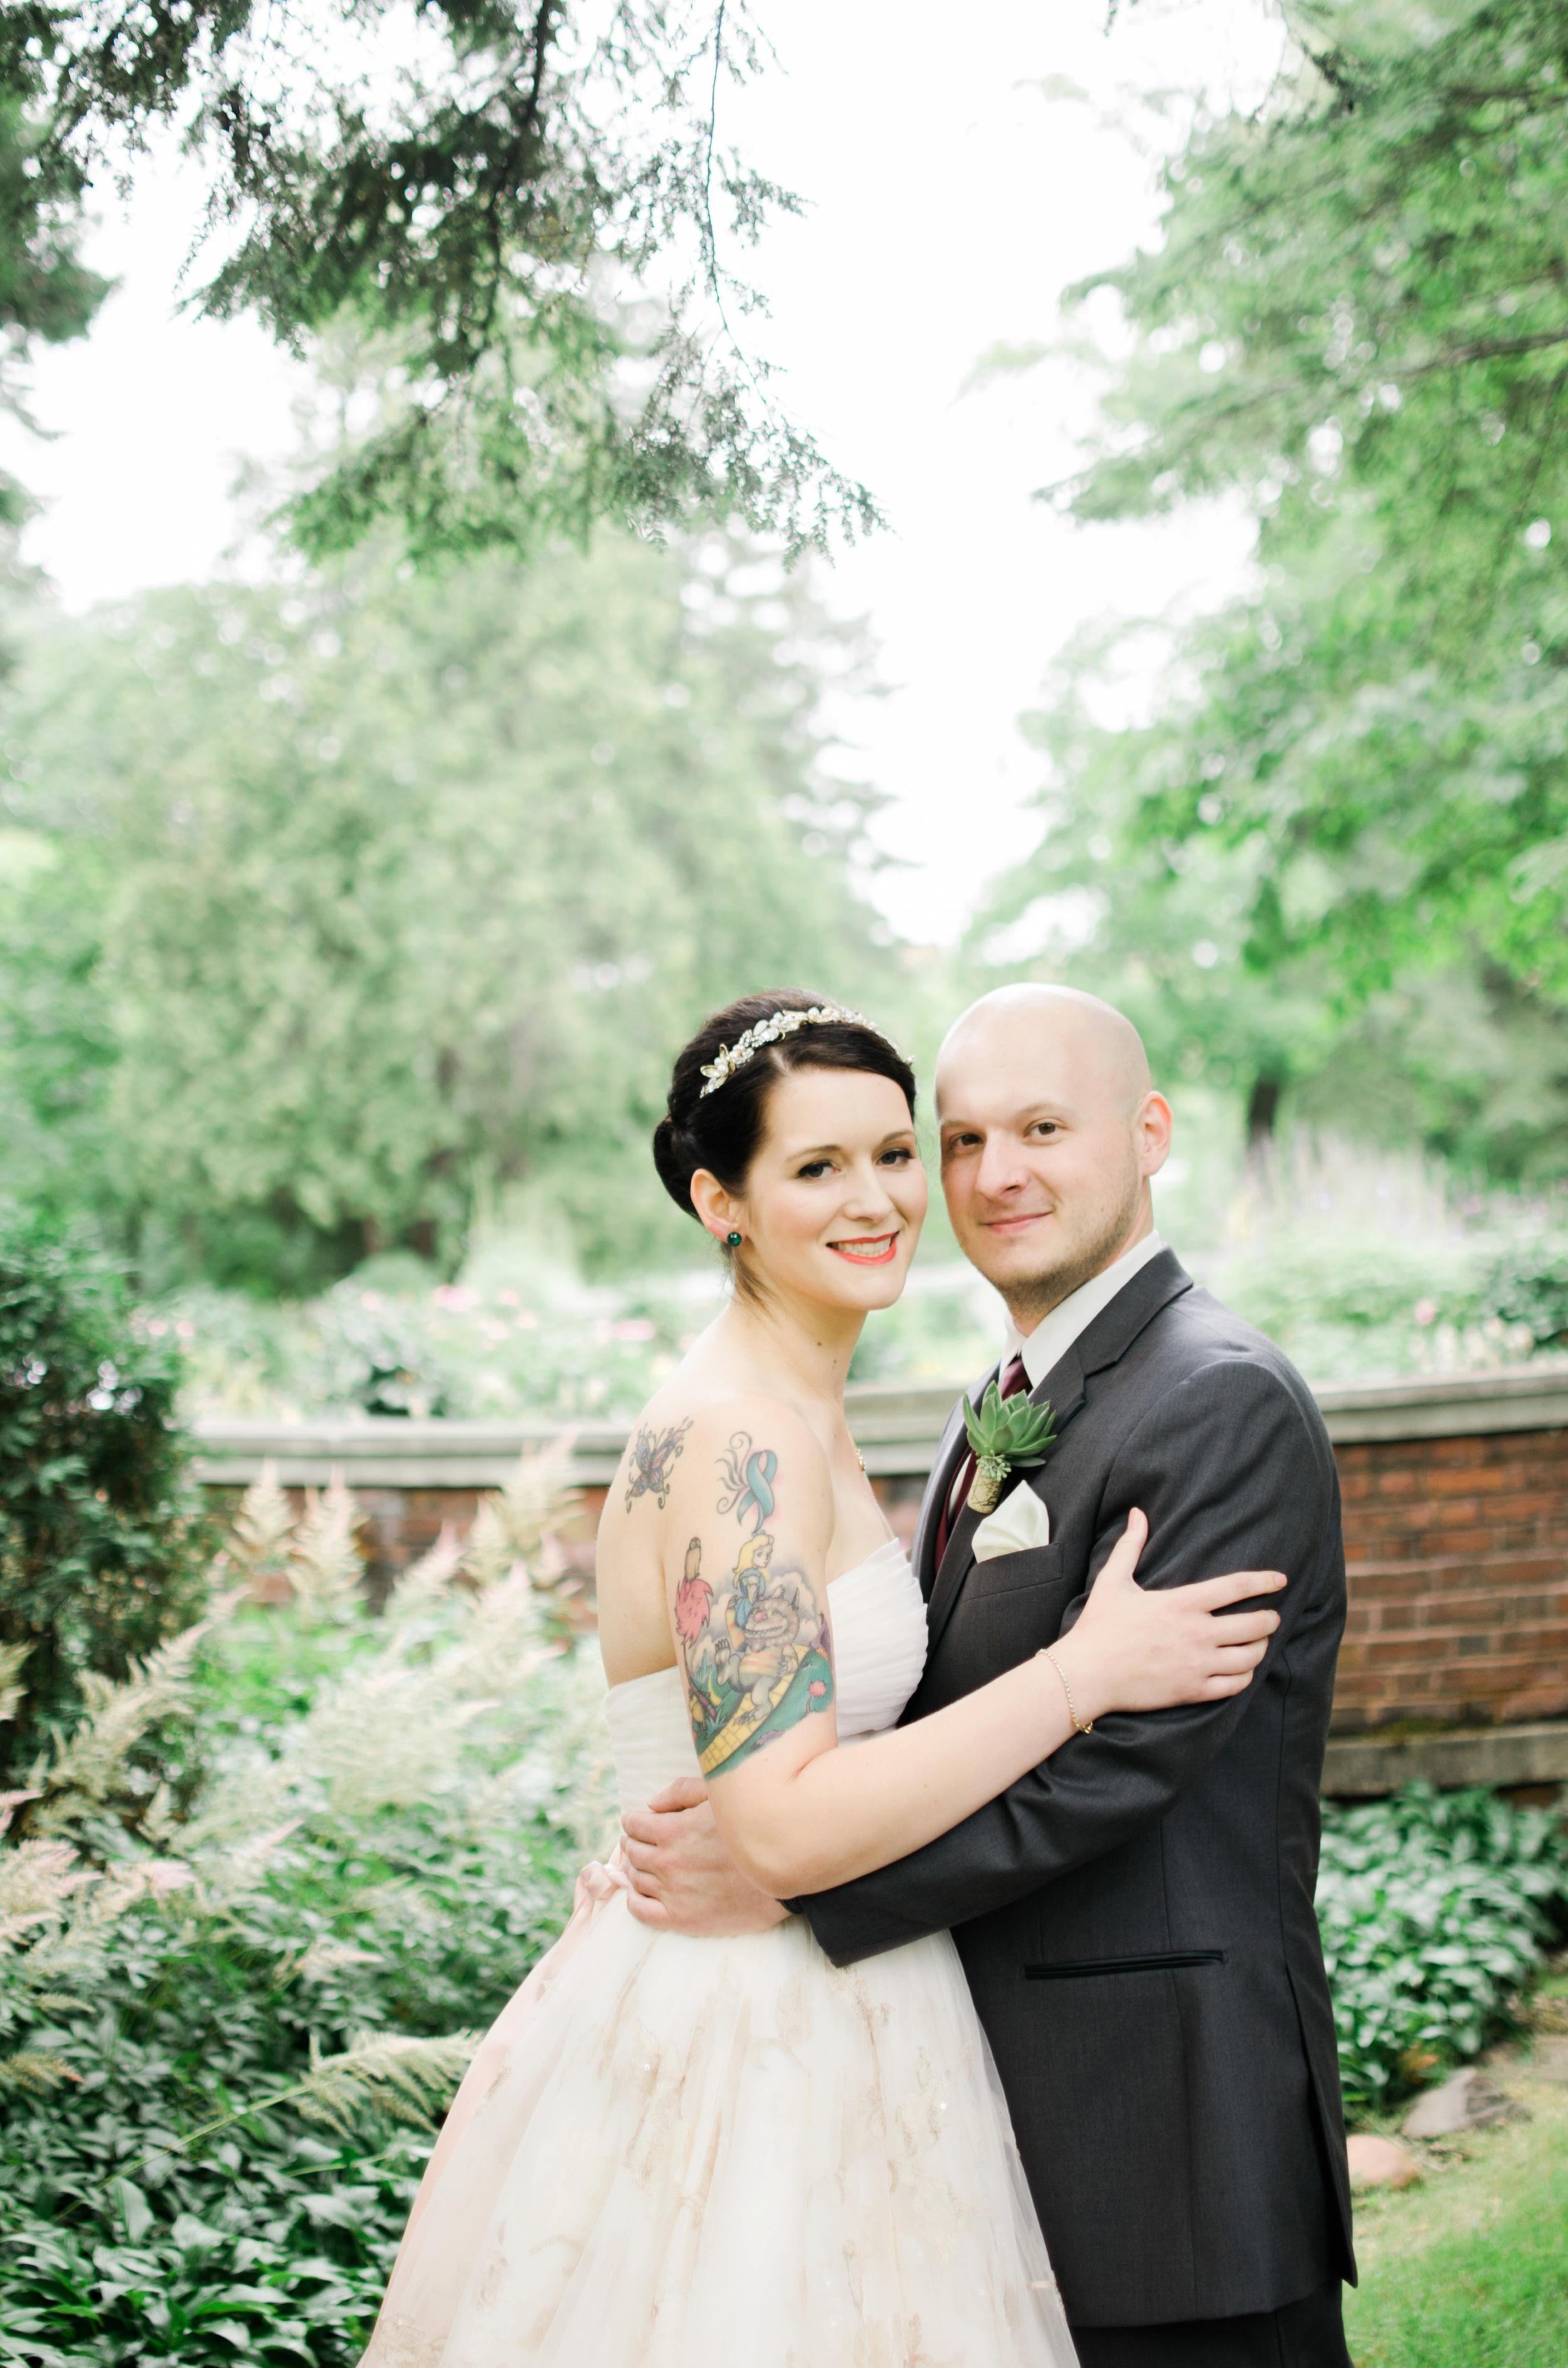 Glensheen Mansion Wedding | Duluth, MN Wedding Photographer_0477.jpg